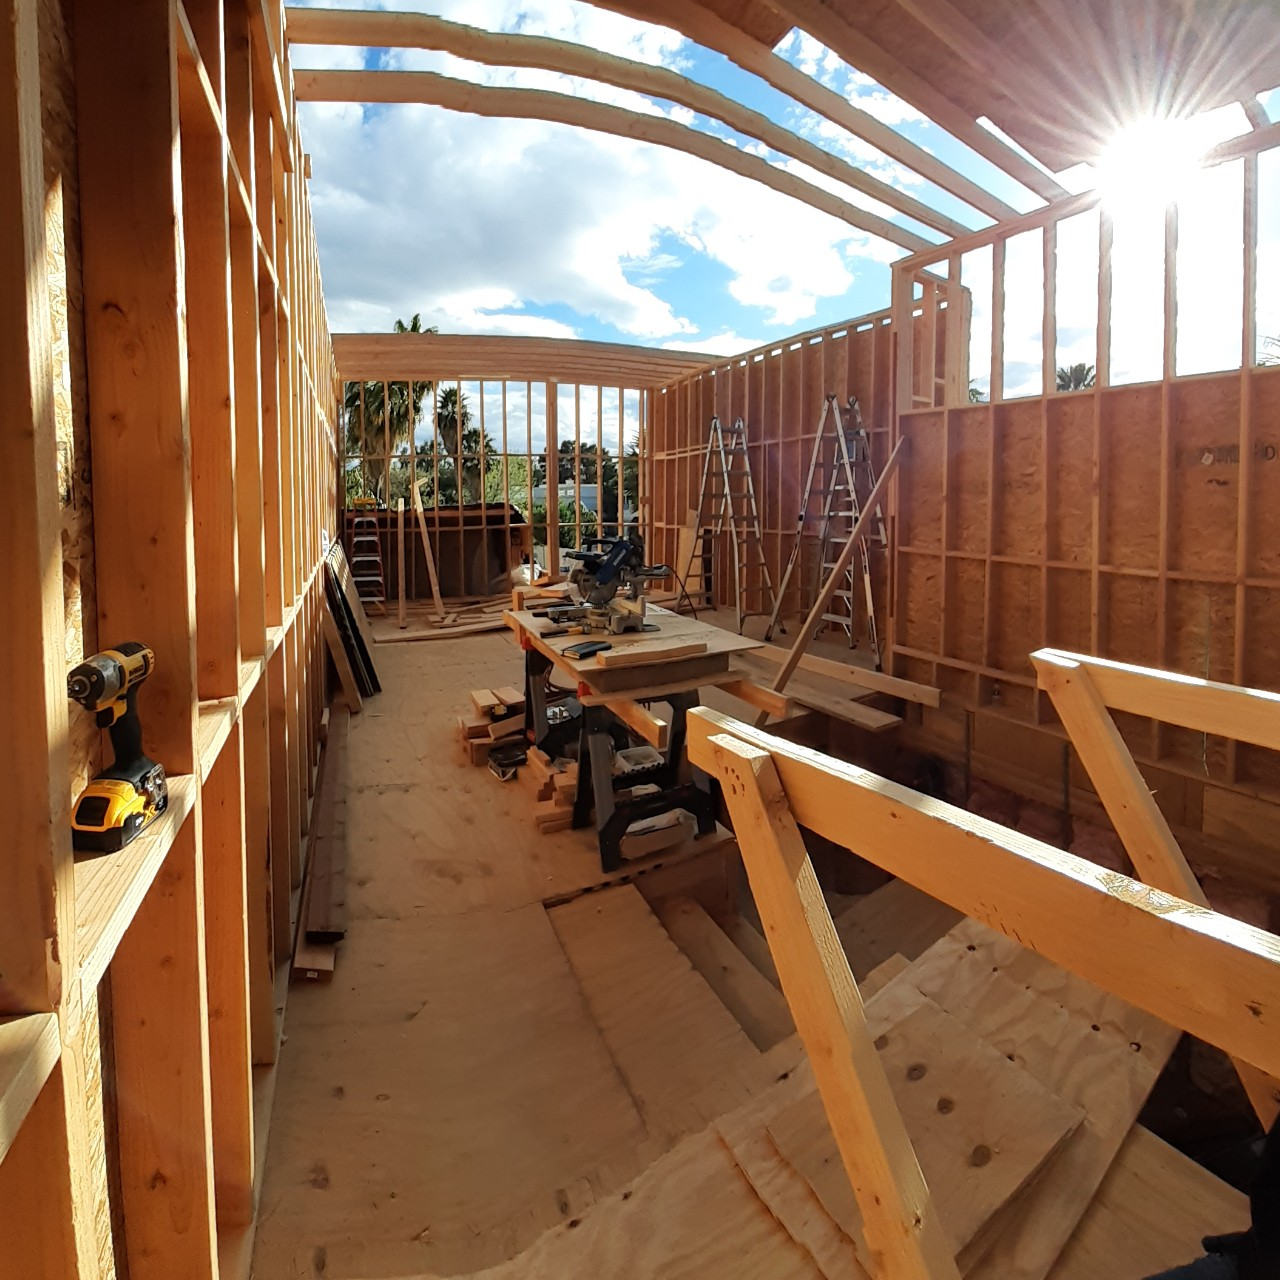 carpentry-wood-framing-second-floor-home-addition--framing-107